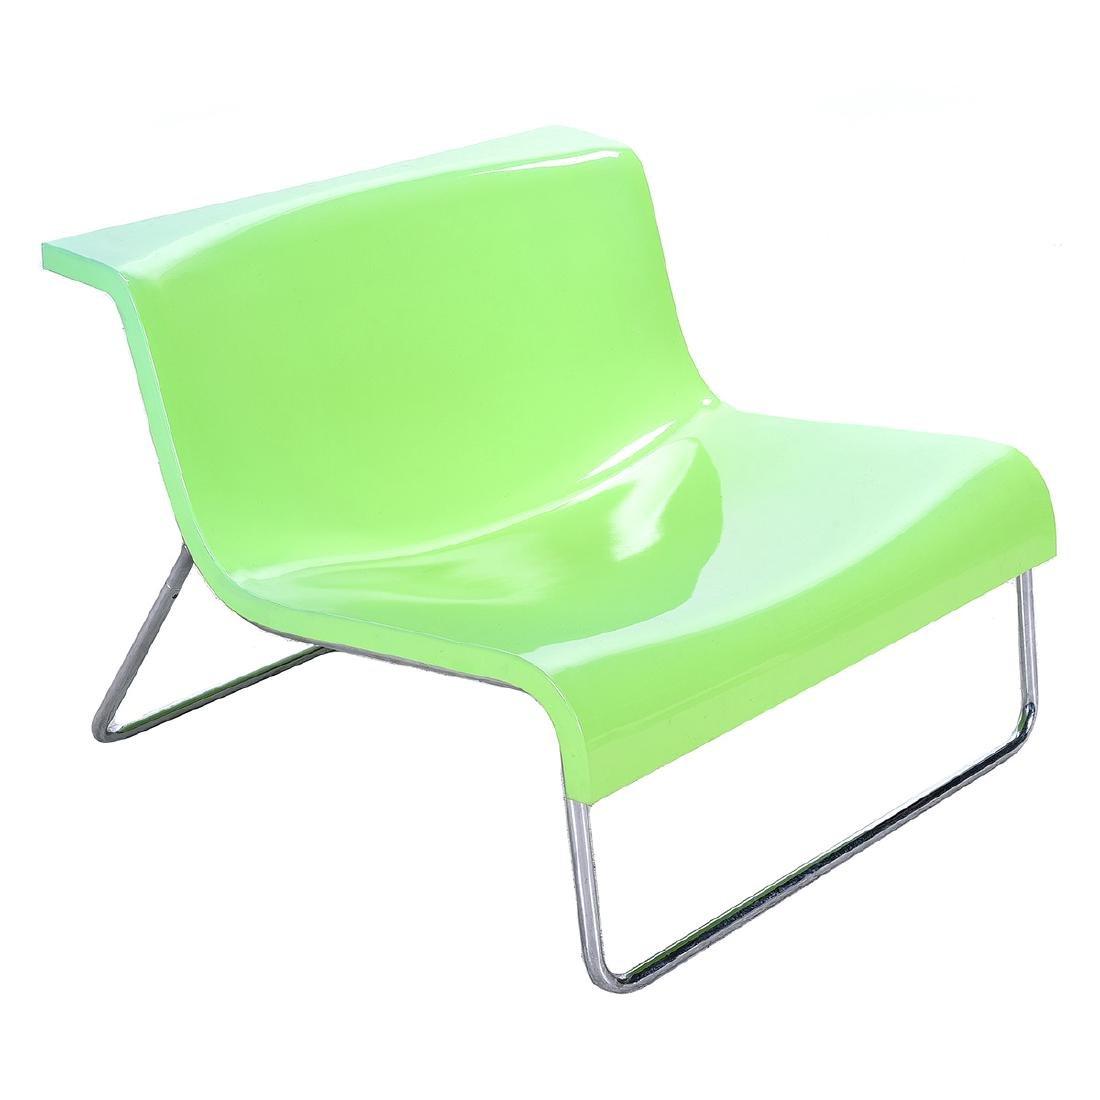 Italian Kartell for Piero Lissoni Form Lime Green